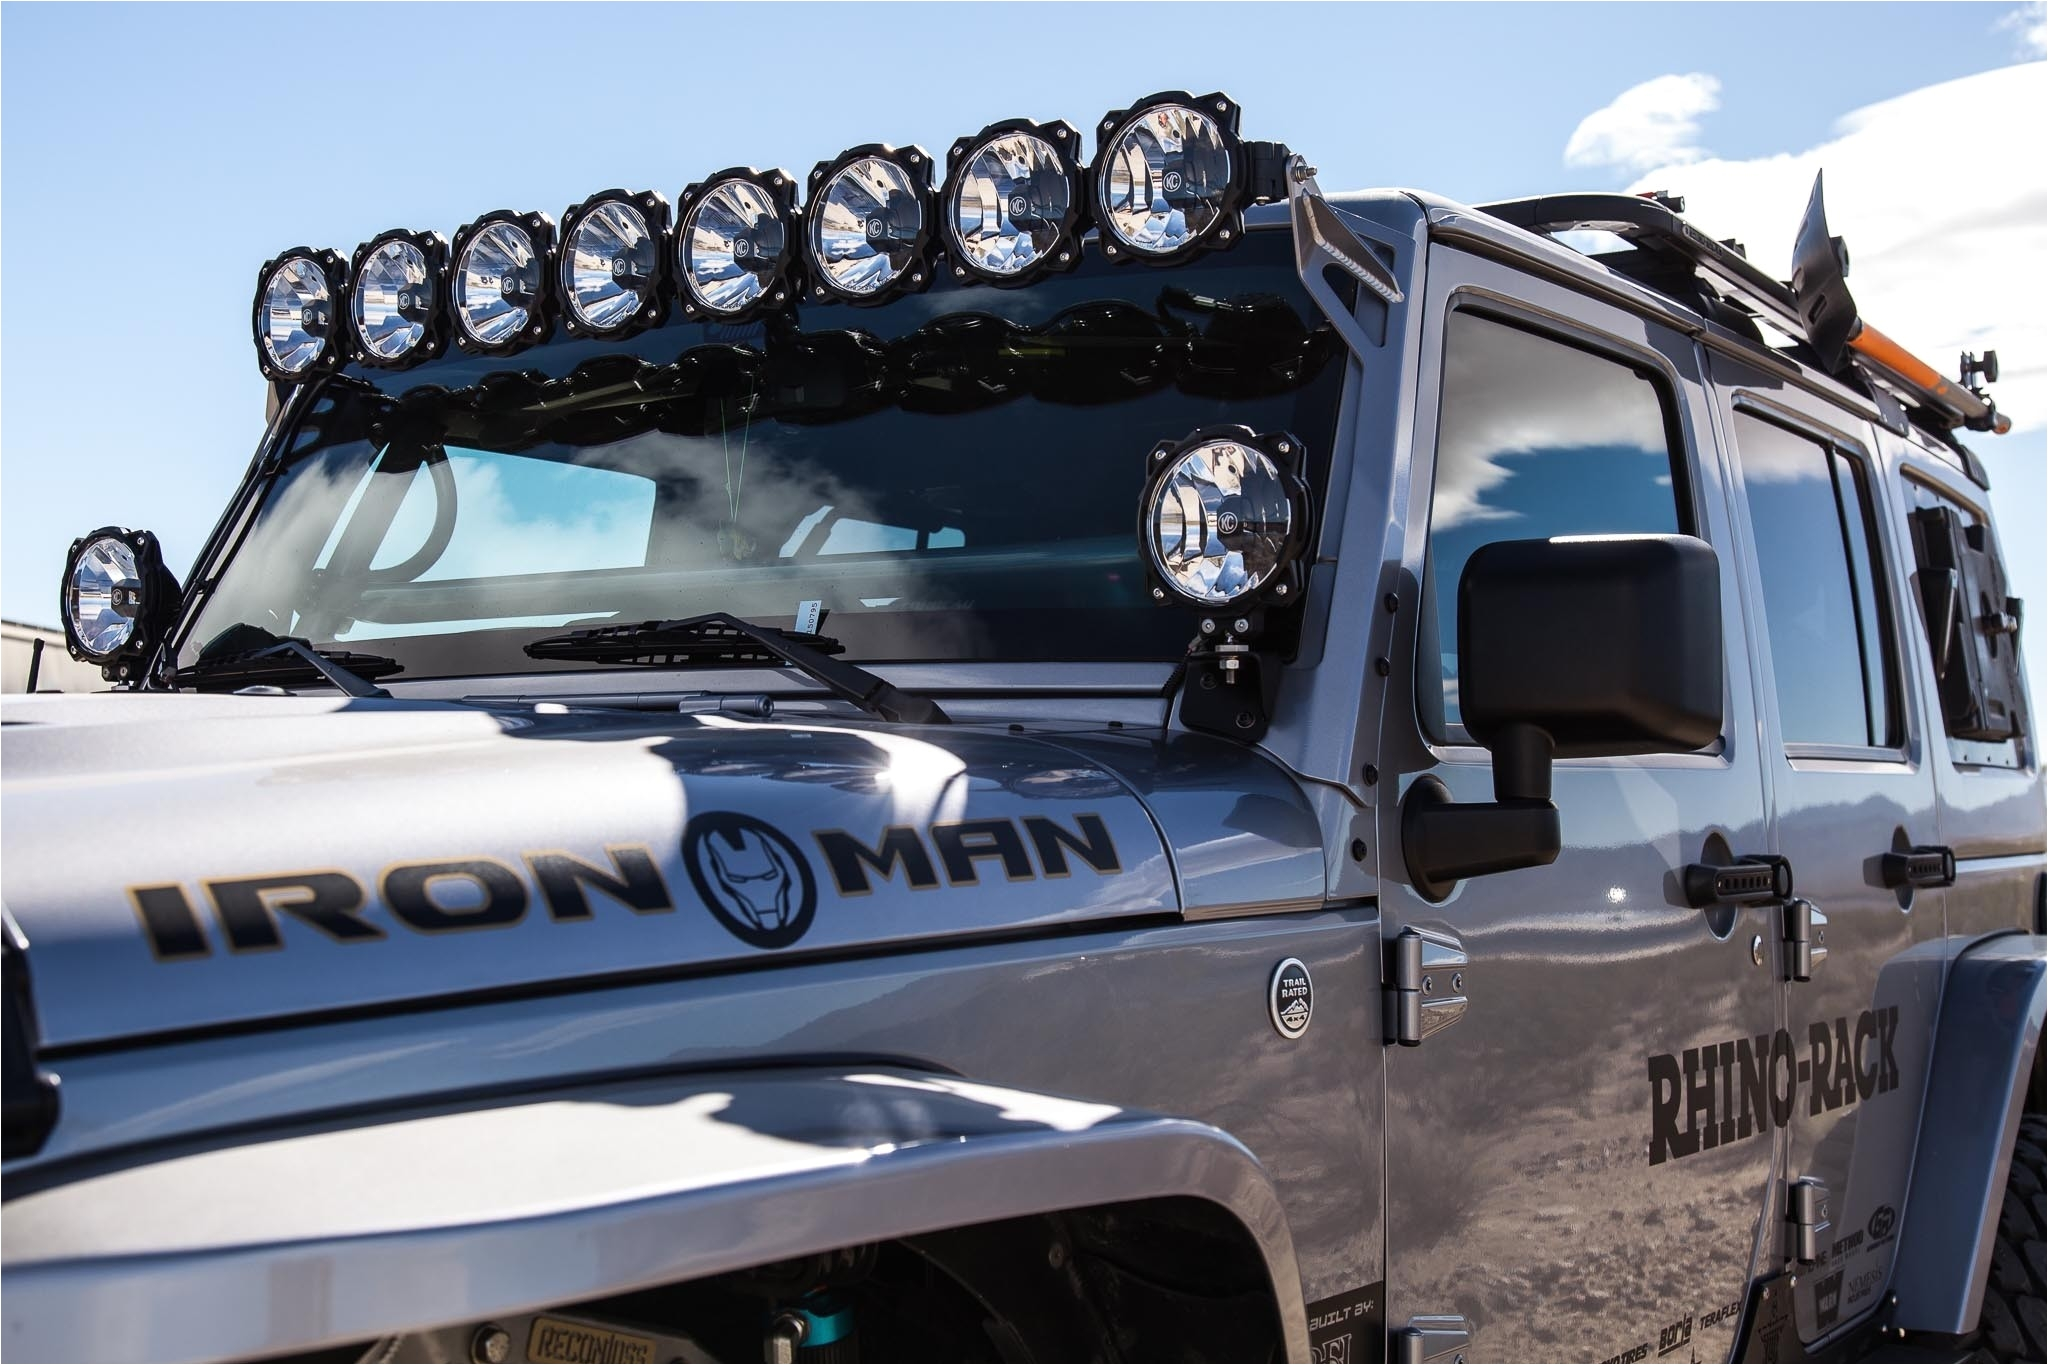 gravitya led pro6 8 light 50 universal combo led light bar on jeep